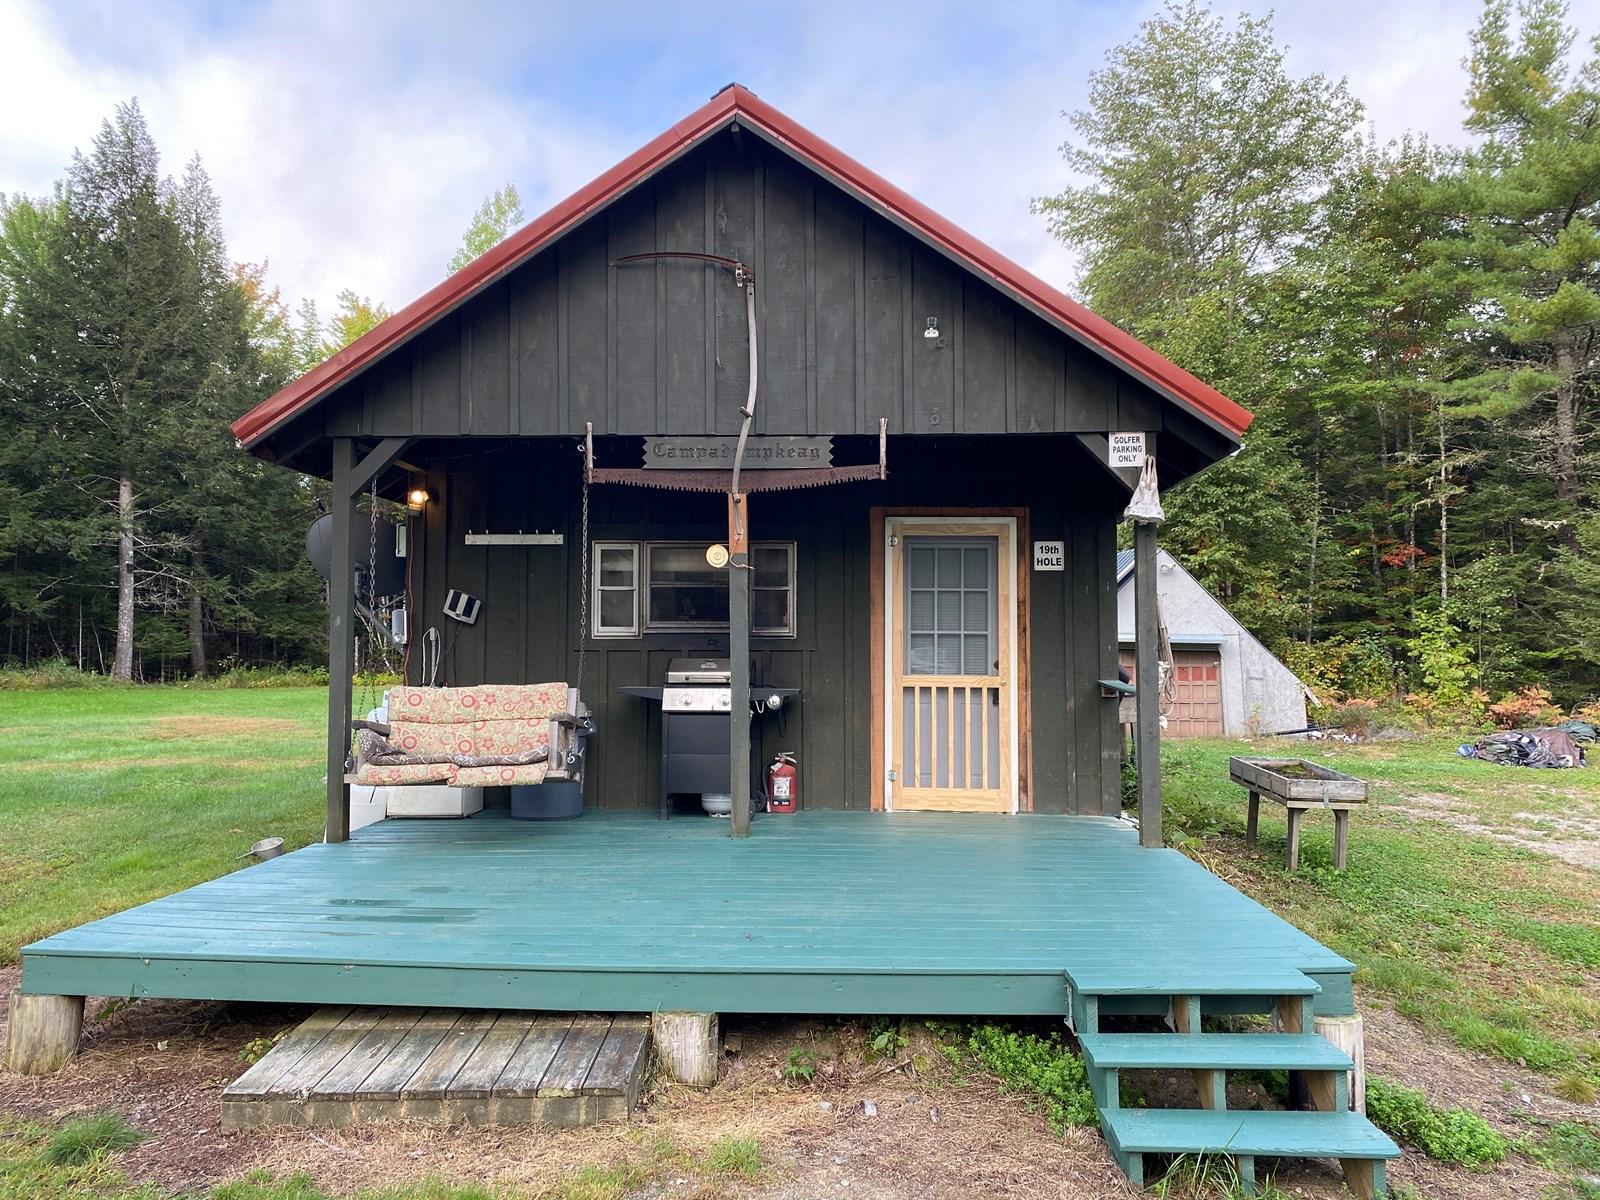 Recreational Camp in Passadumkeag, Maine